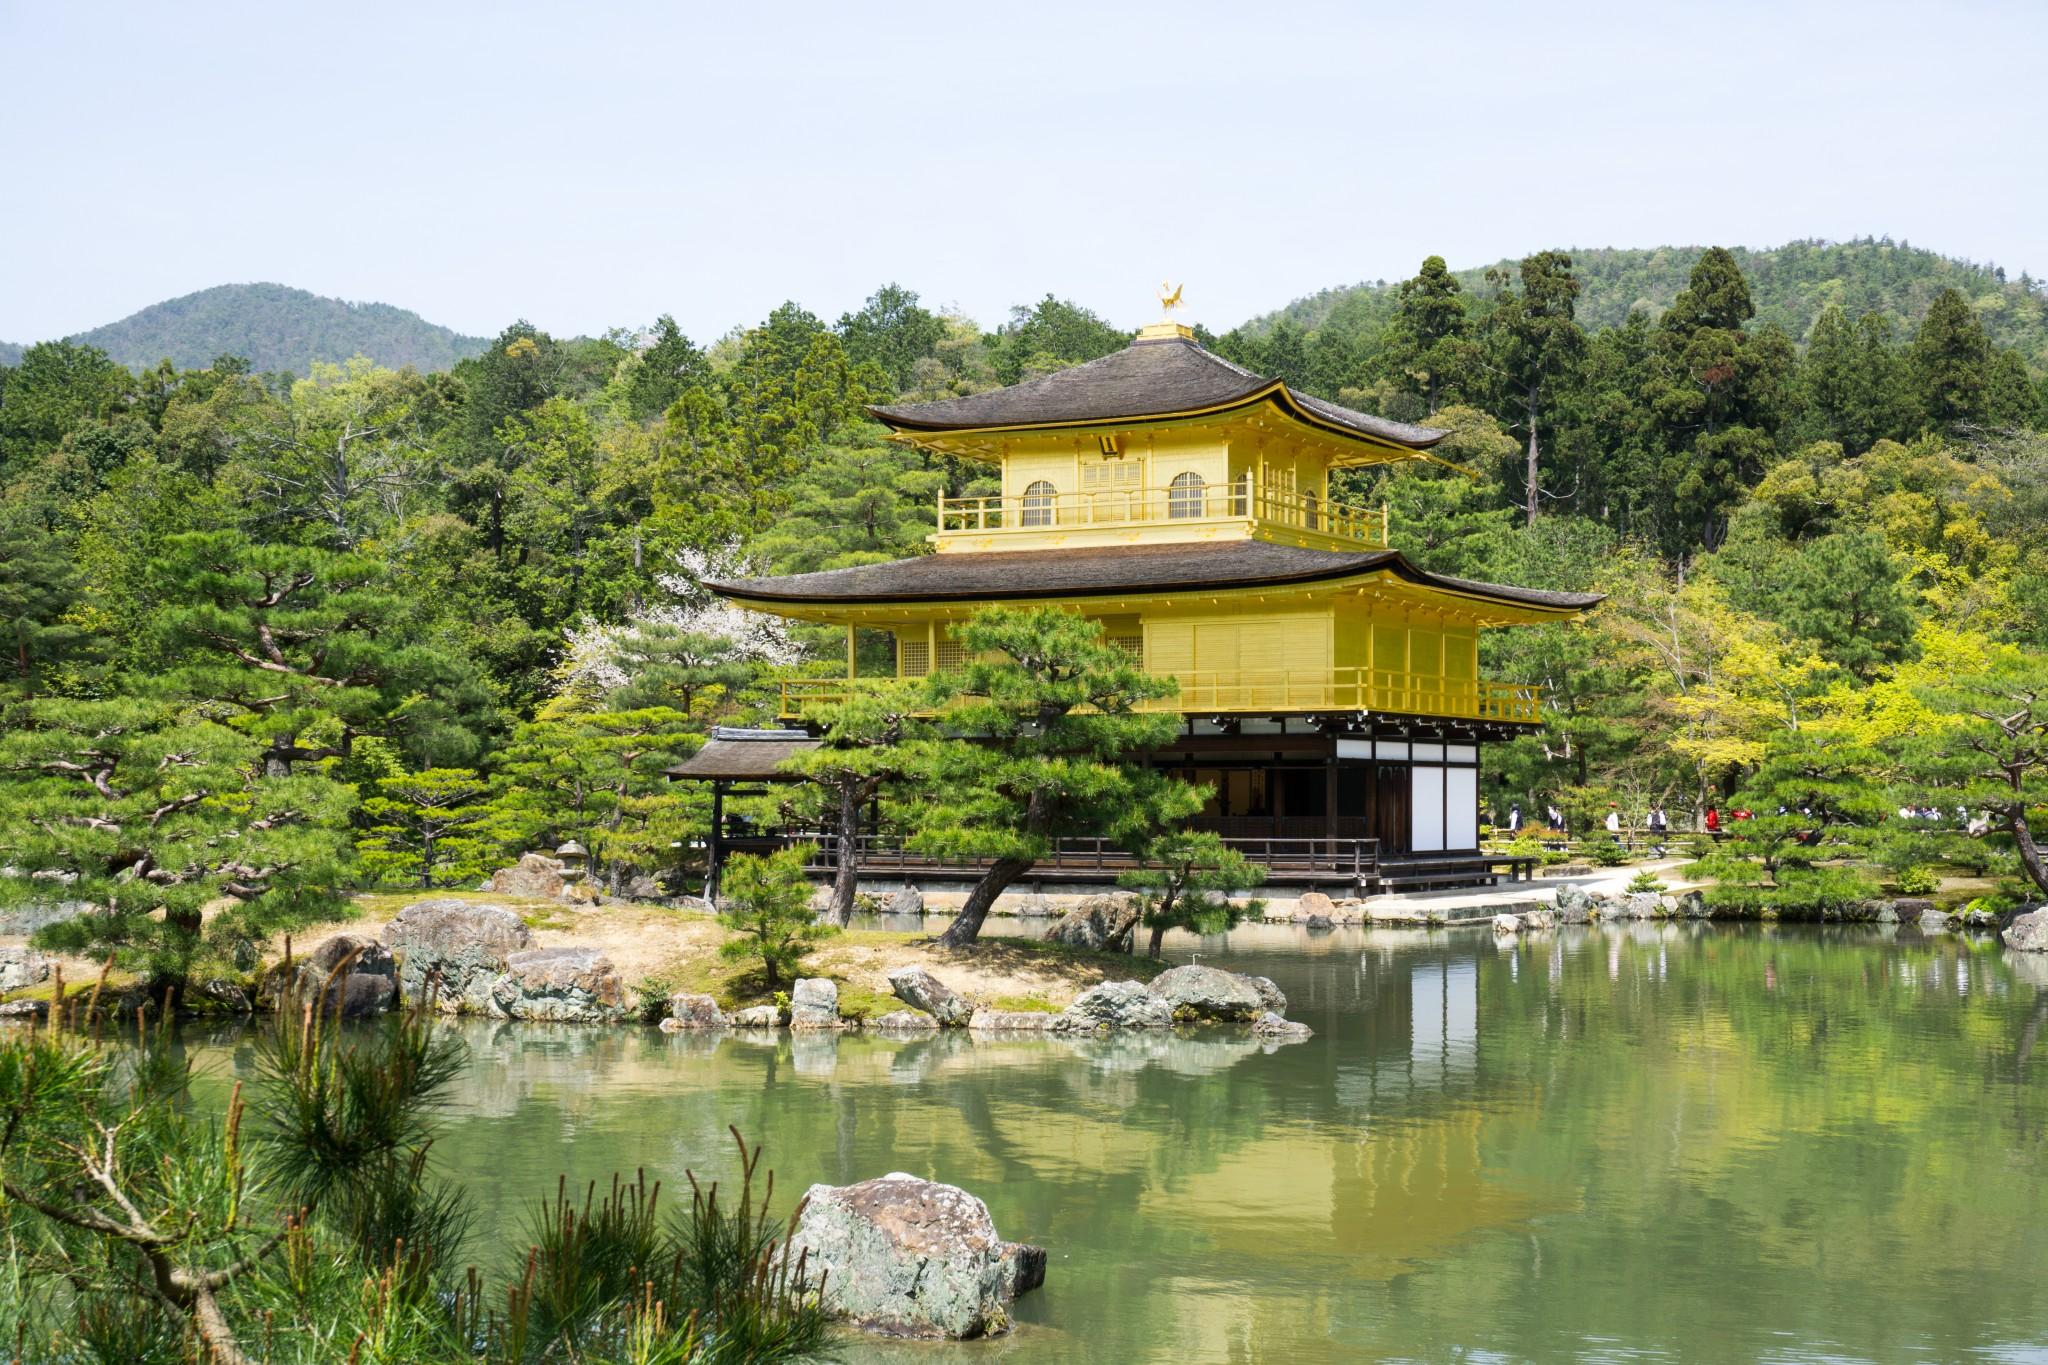 Kinkaku-ji Temple (Gold Temple), Kyoto